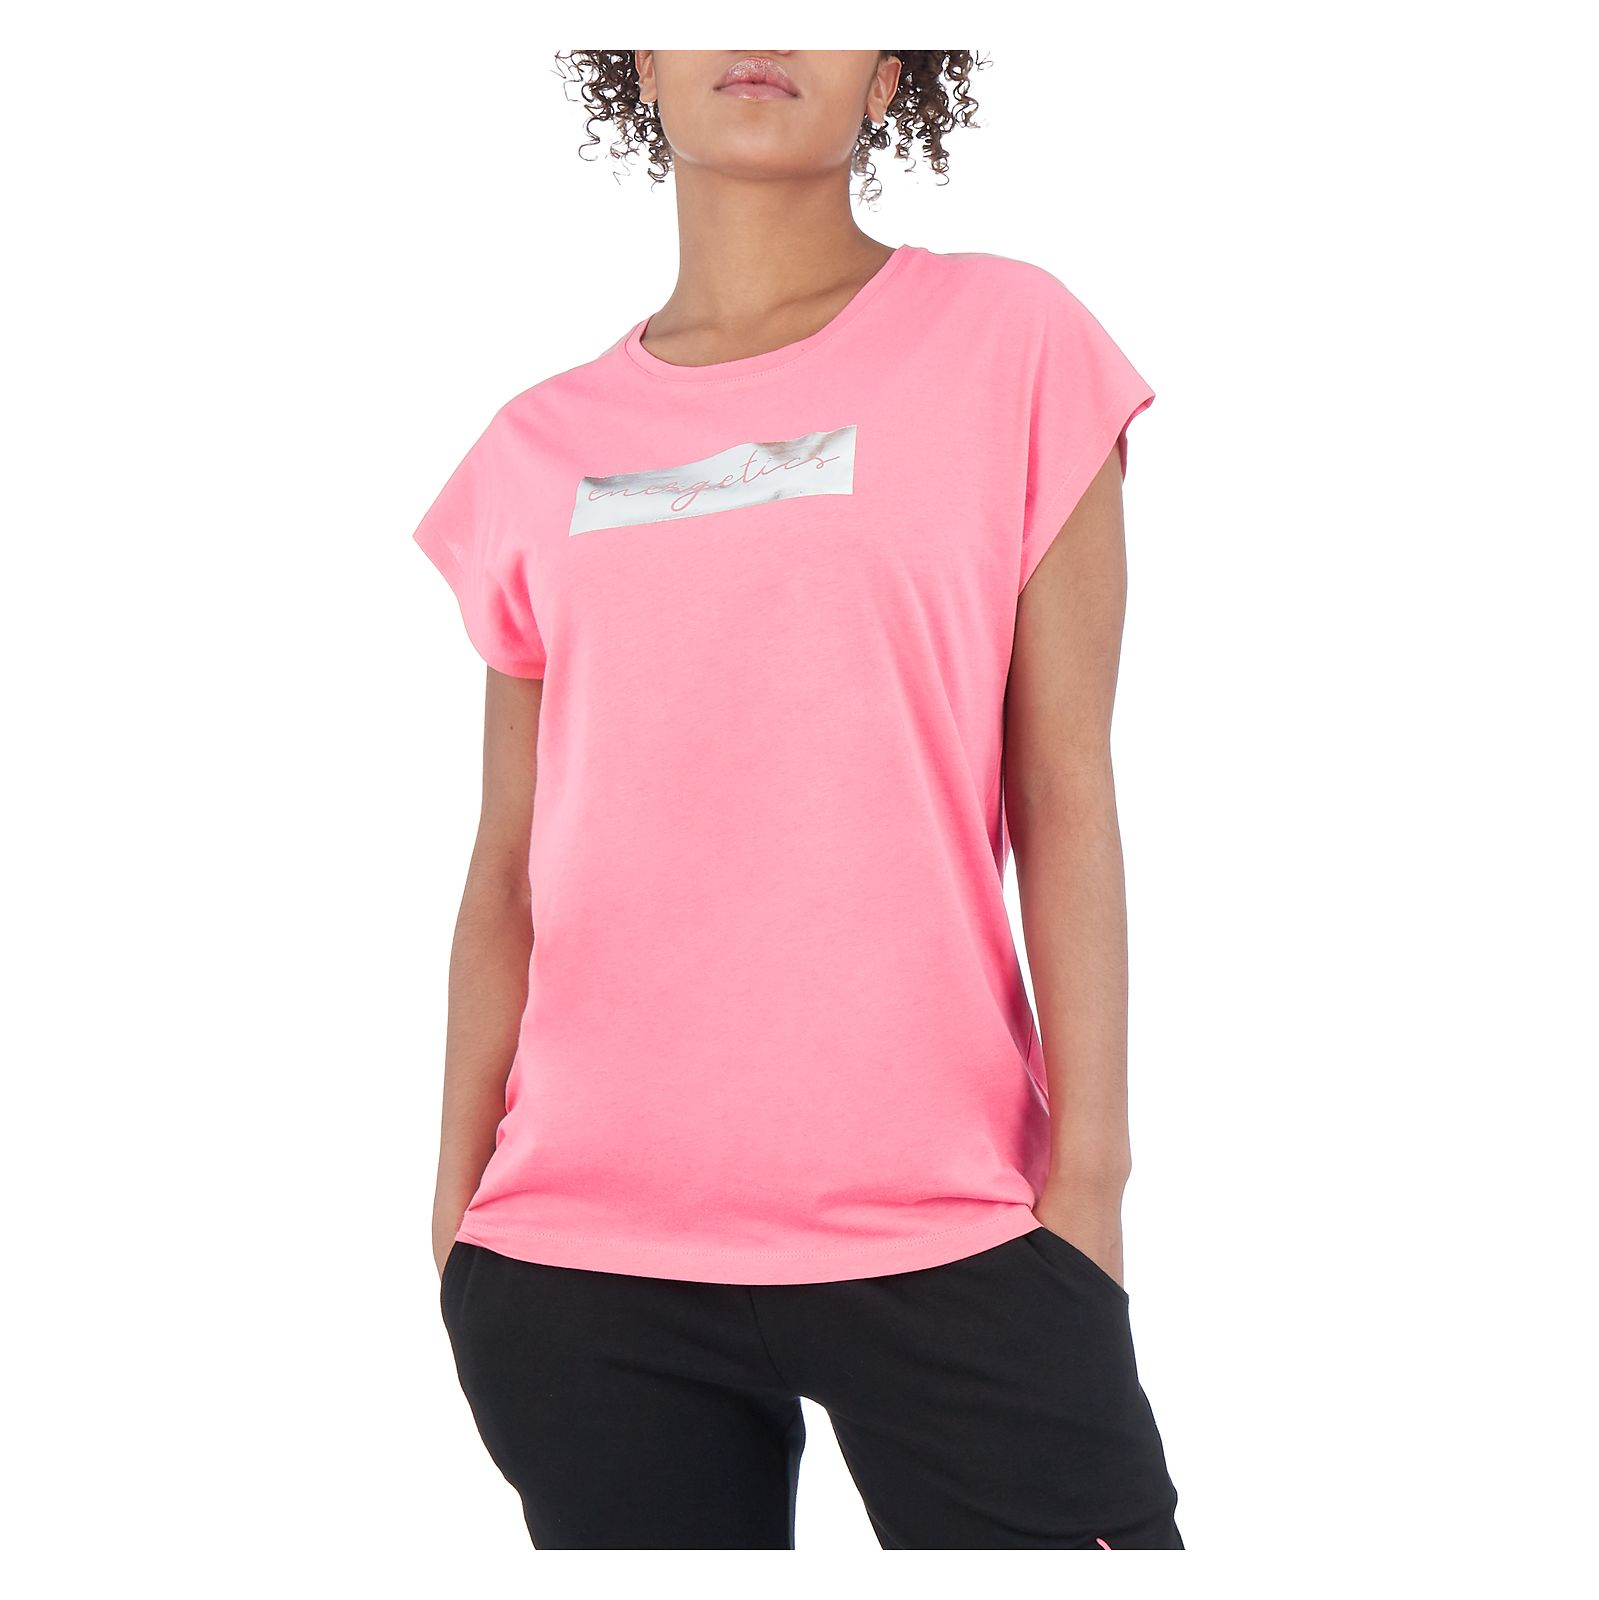 Koszulka damska Energetics Hemmy 302552